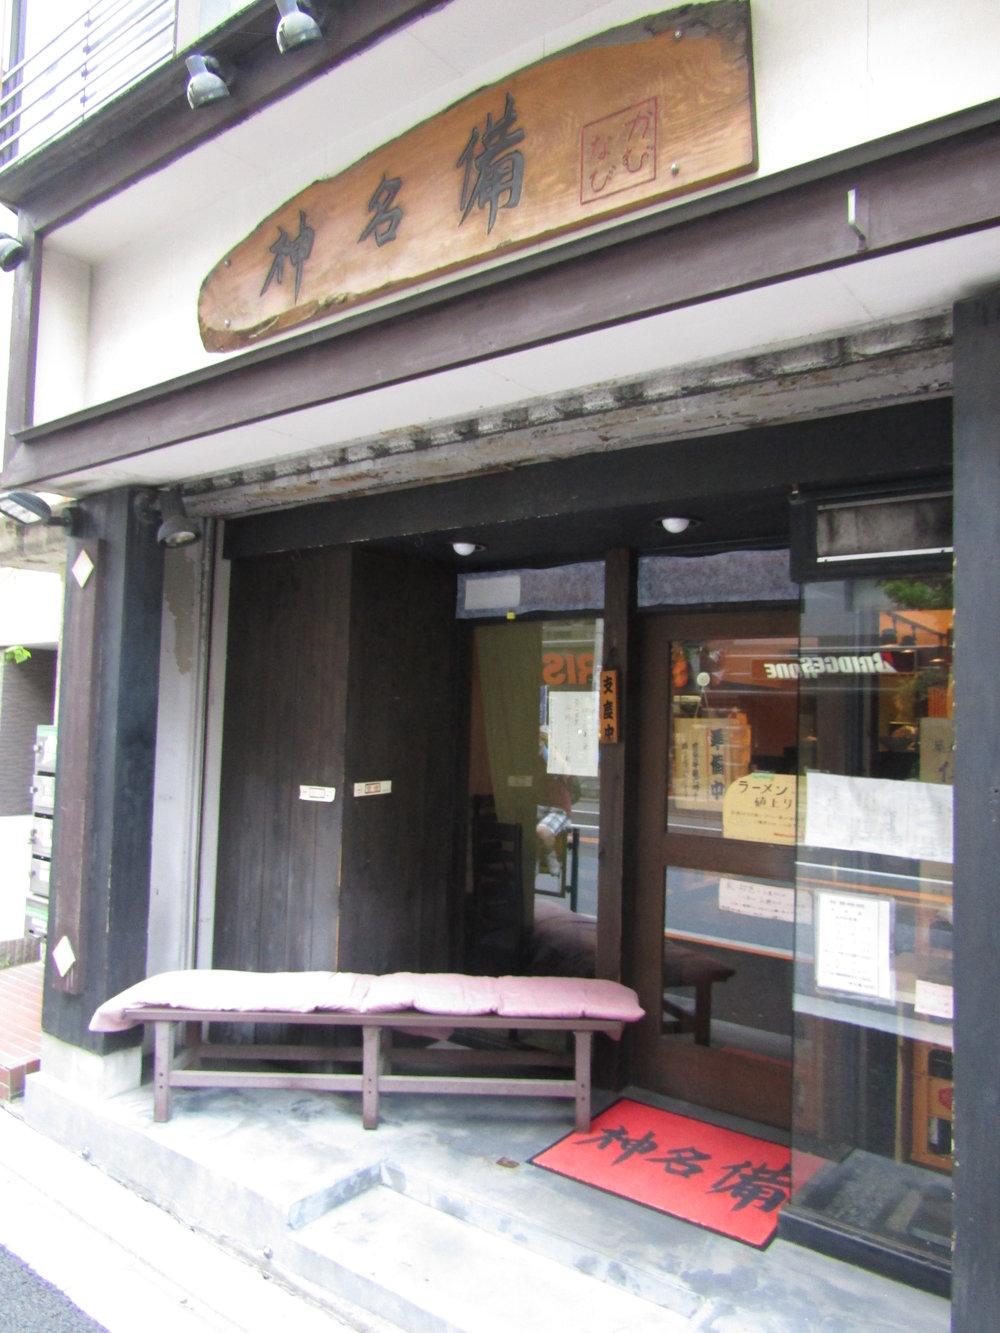 Kamunabi Sign 4.JPG